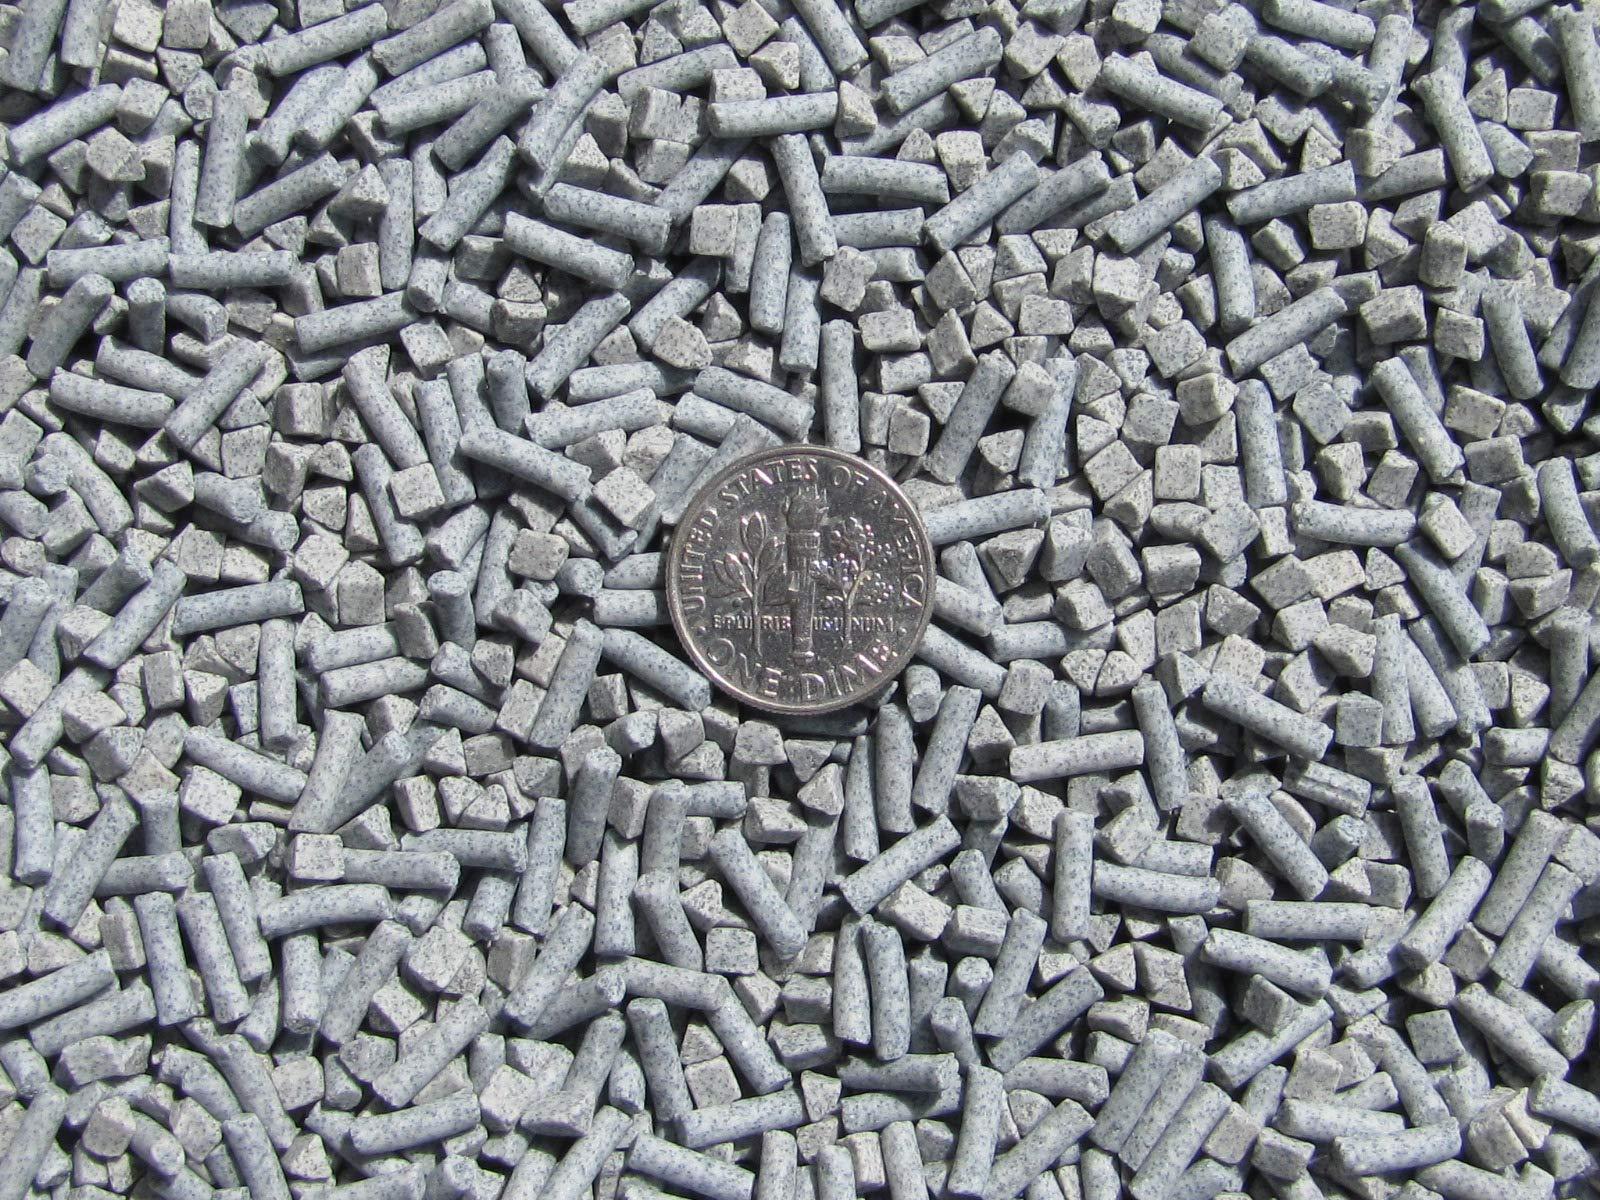 8 Lb. 3 mm Triangle & 2.5 X 8 mm Pins Fast Cutting Abrasive Ceramic Porcelain Tumbling Tumbler Tumble Media by Algrium Glassworks (Image #2)